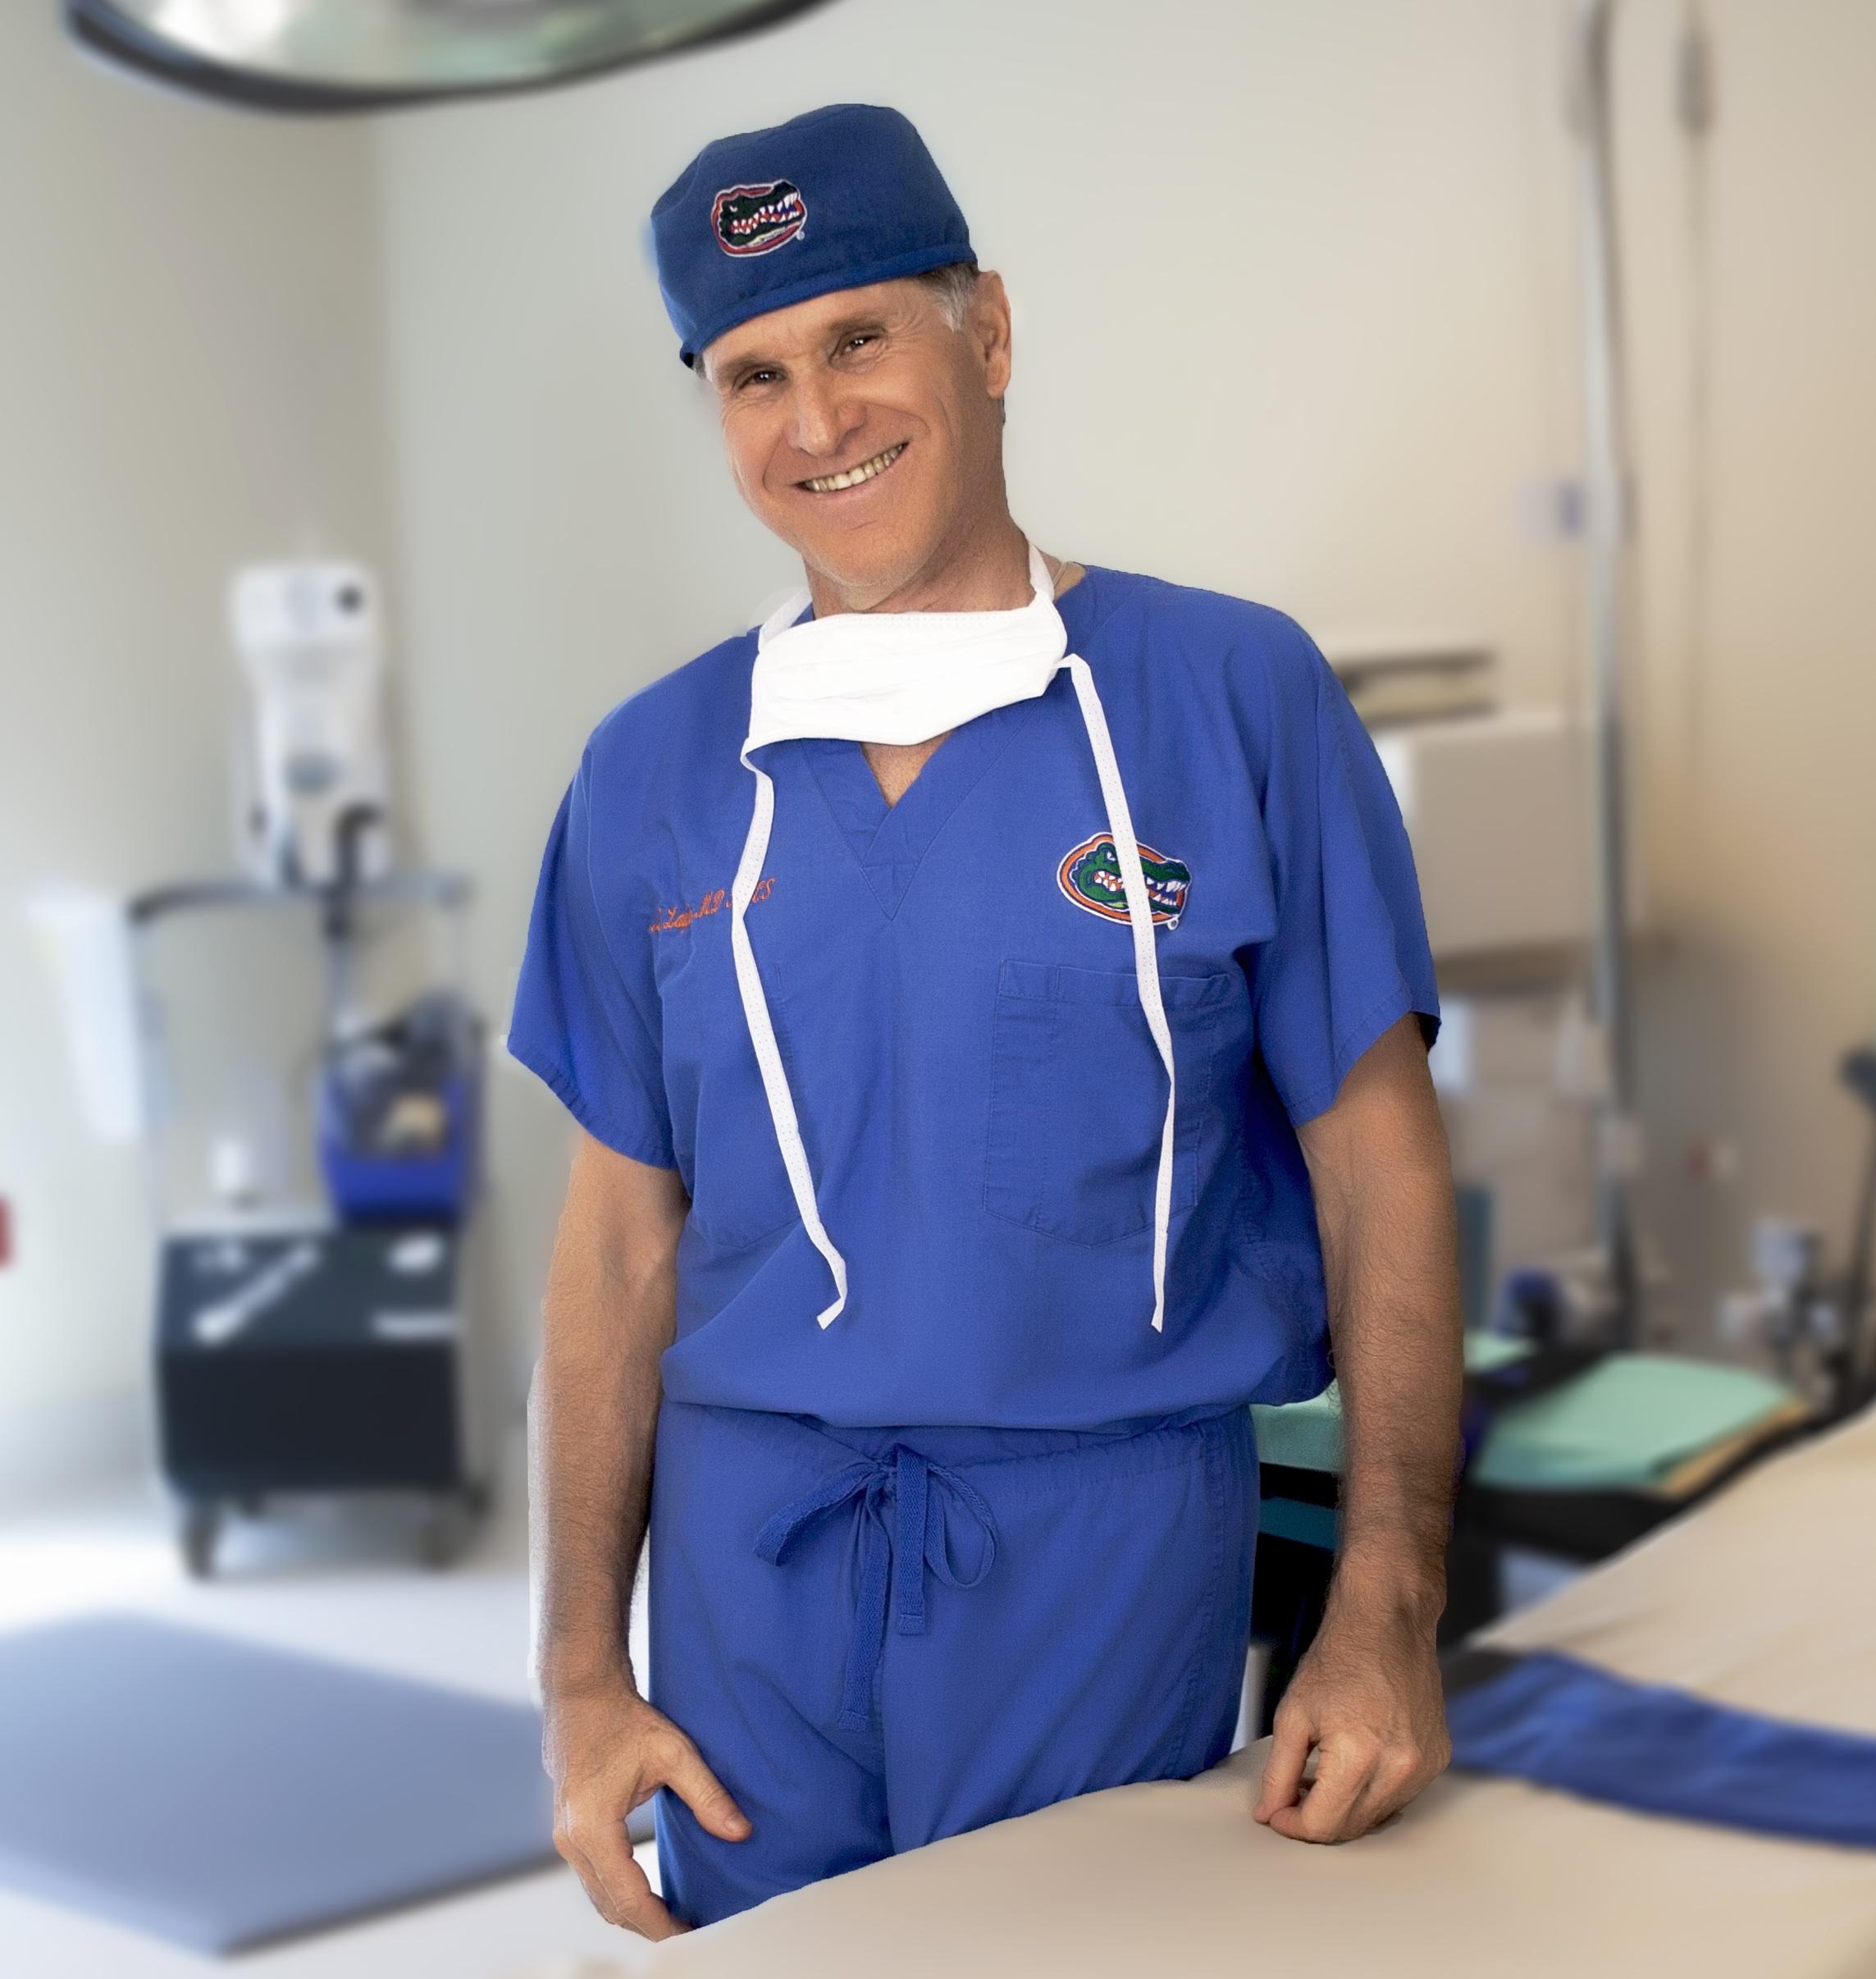 Laufer: Best Of The Bay Nip & Tuck Award 2014 For Plastic Surgeons